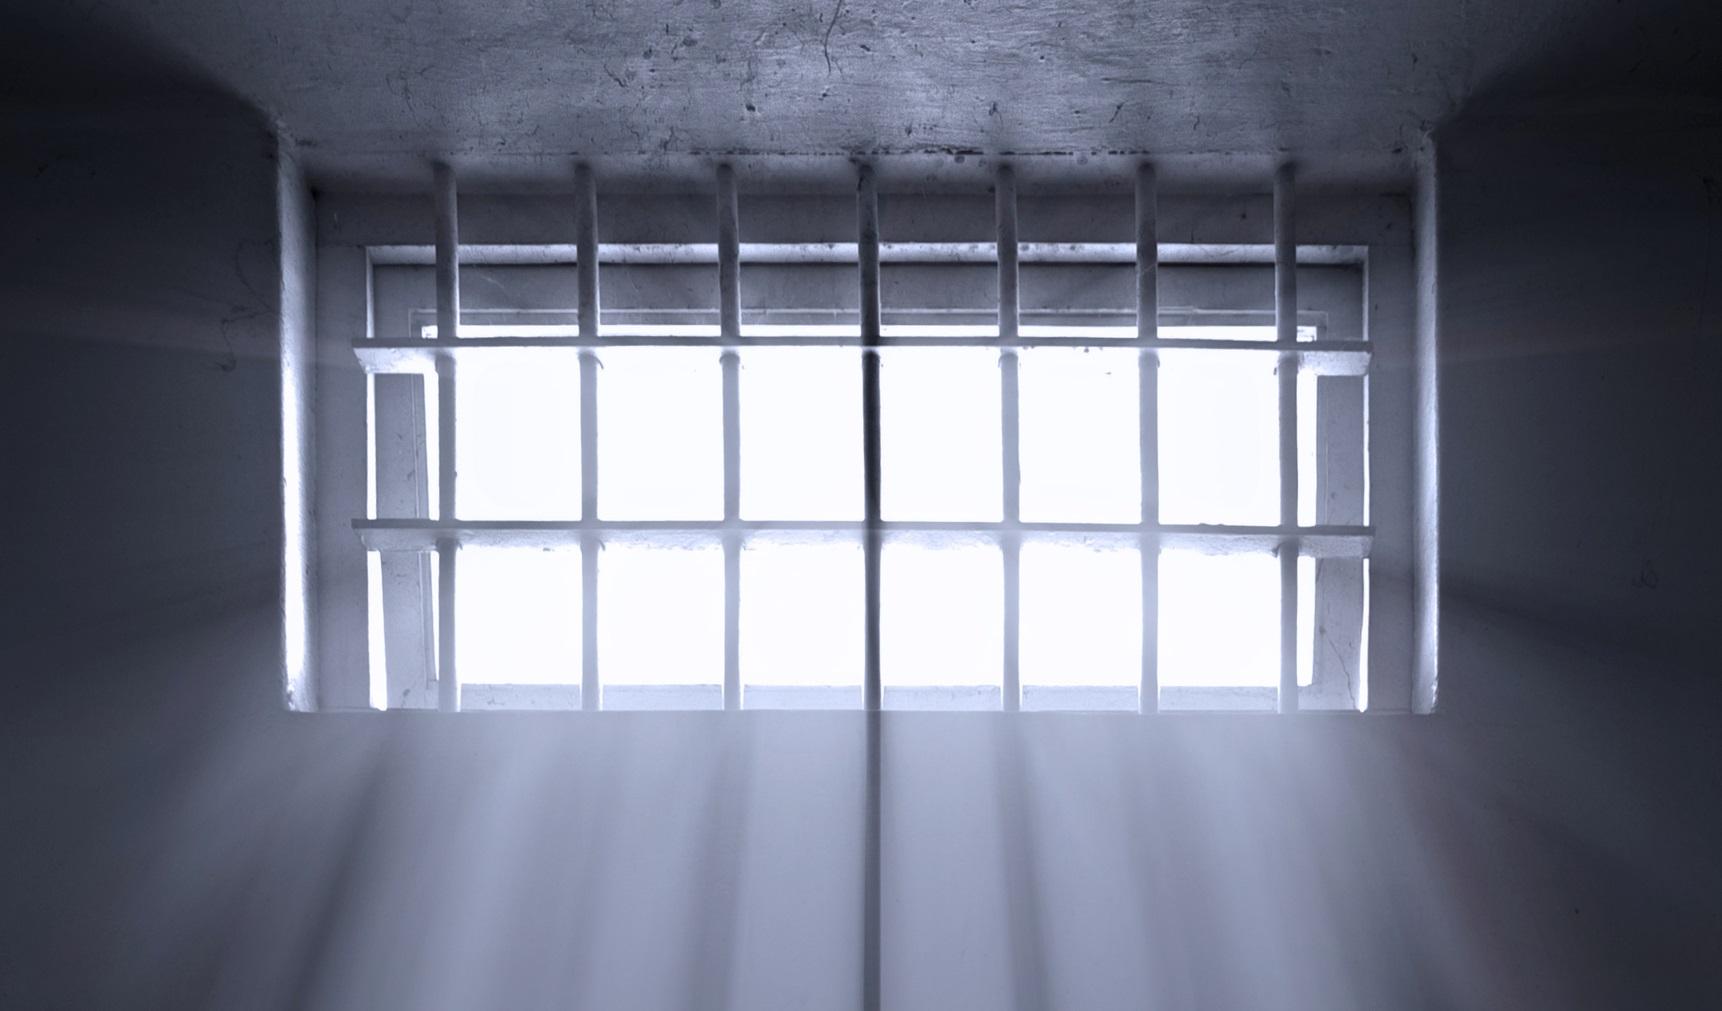 Delivering end of life care in prison